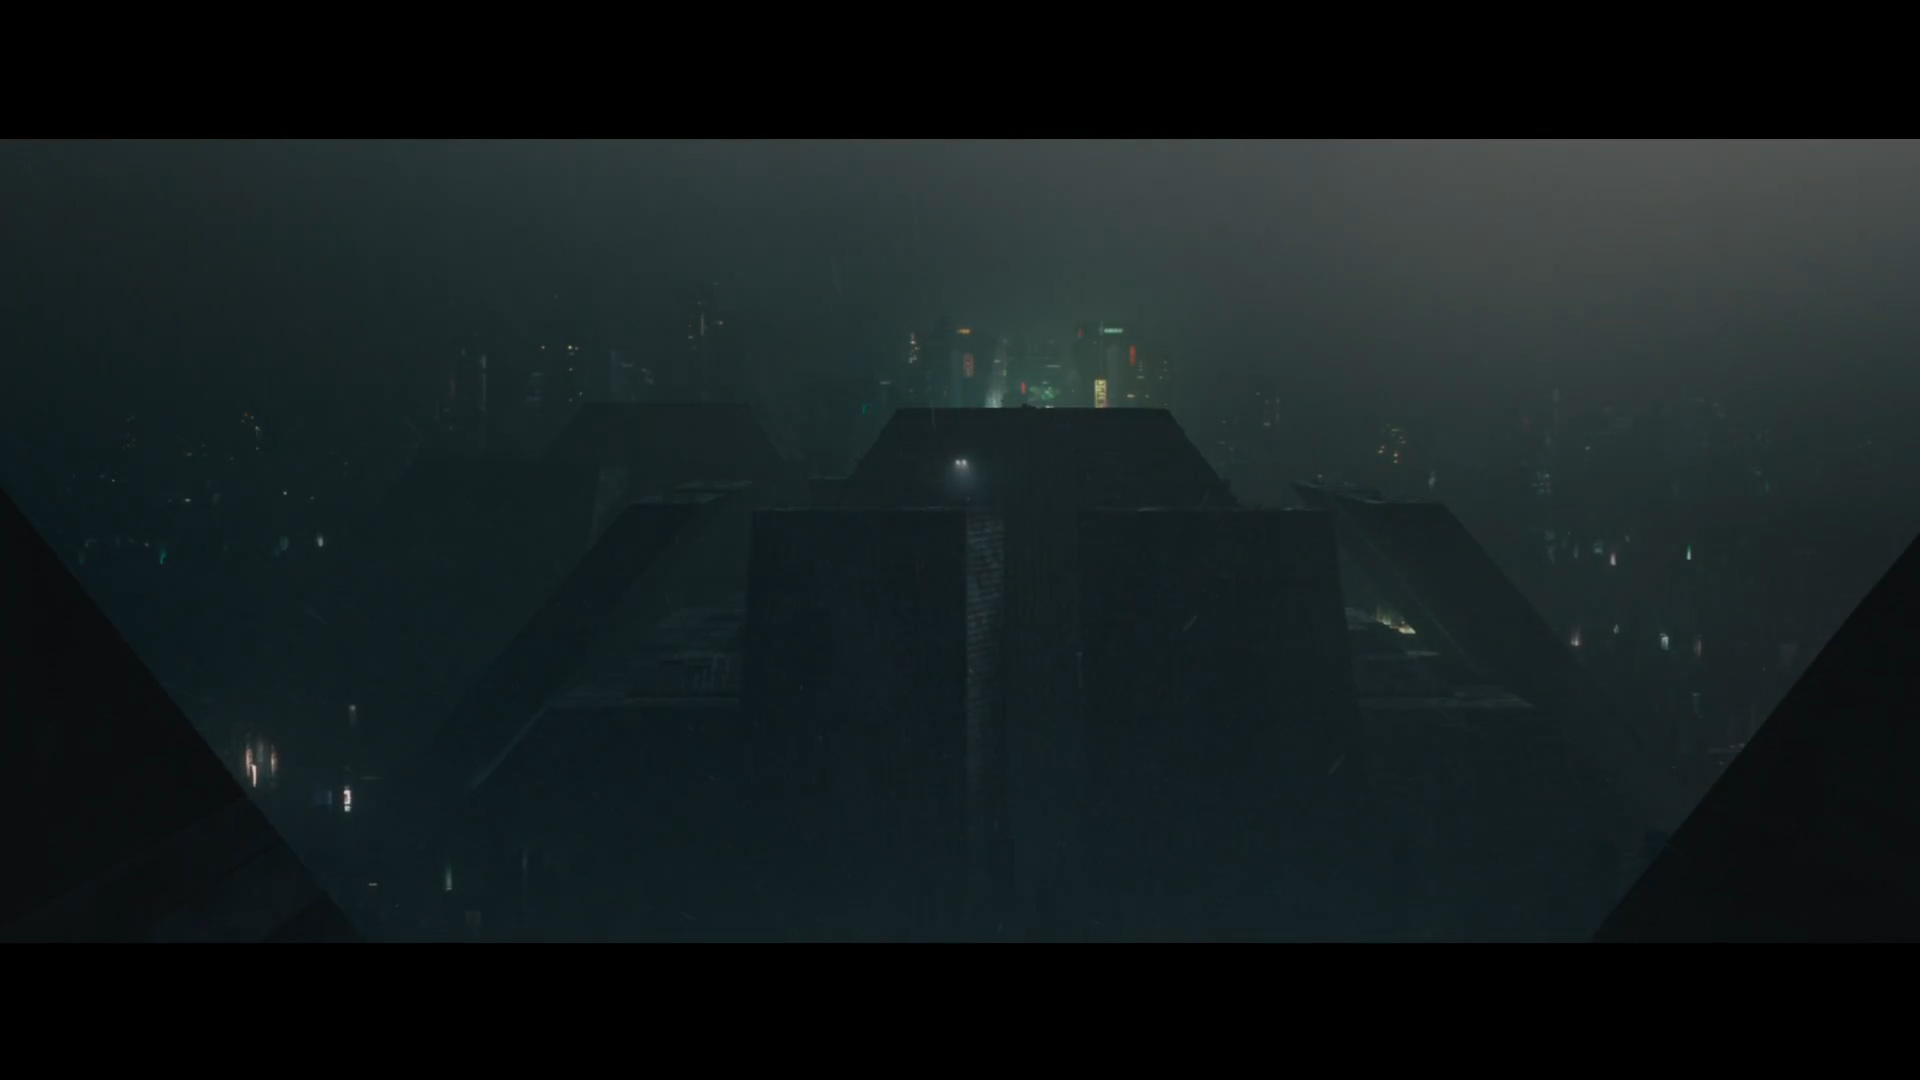 Blade Runner 2049 Wallpapers From Trailer 1920x1080: Blade Runner 2049 Trailer Wallpapers #3 Resized By Ze Robot